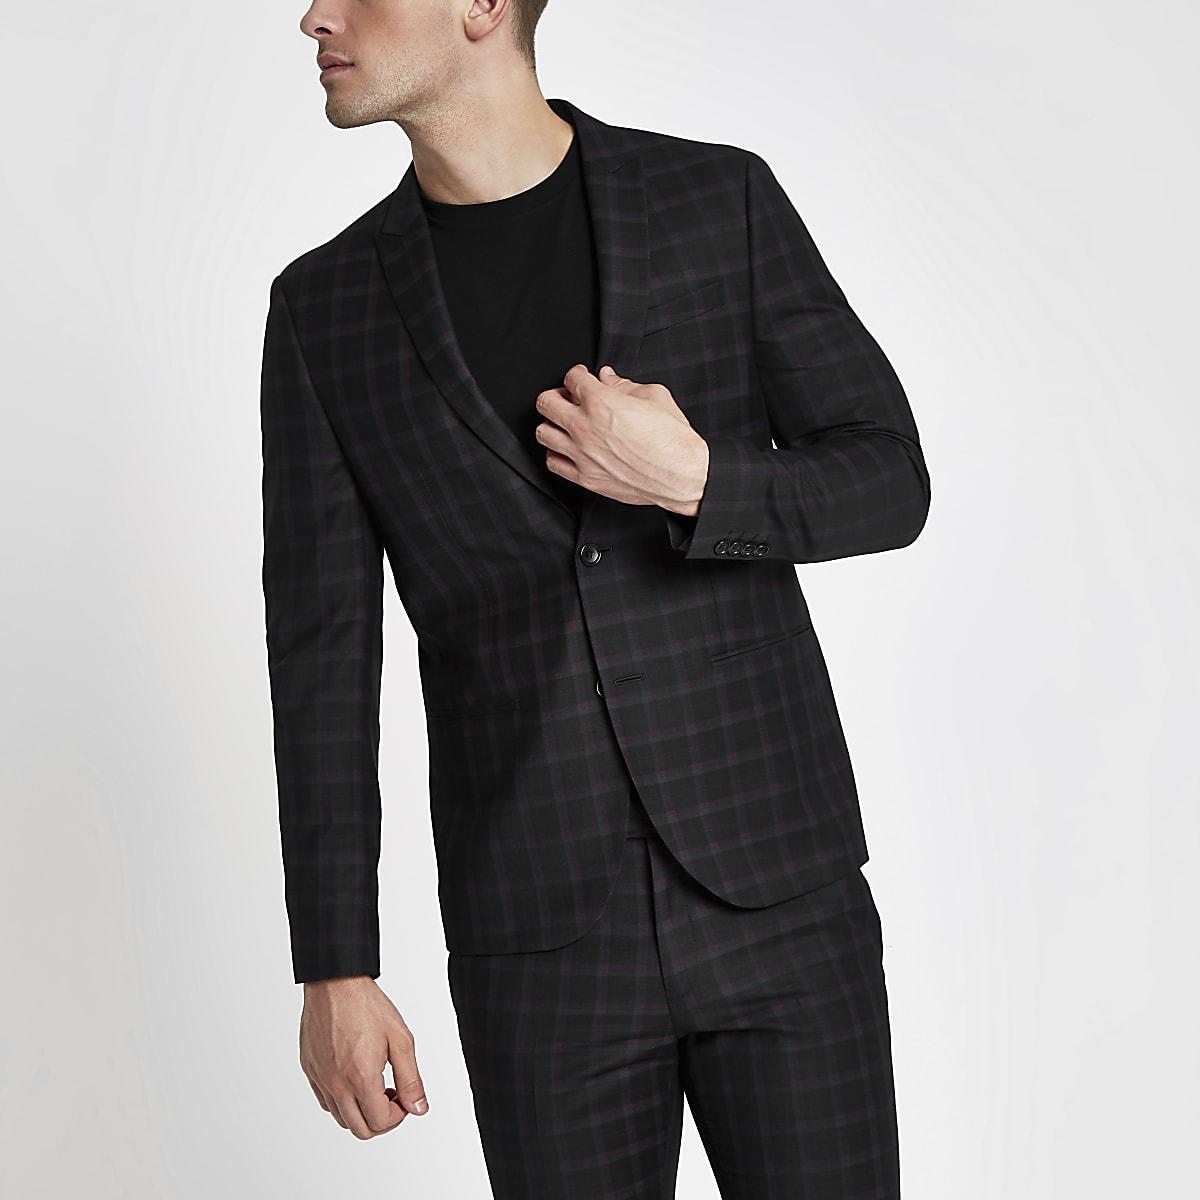 Black check skinny fit suit jacket